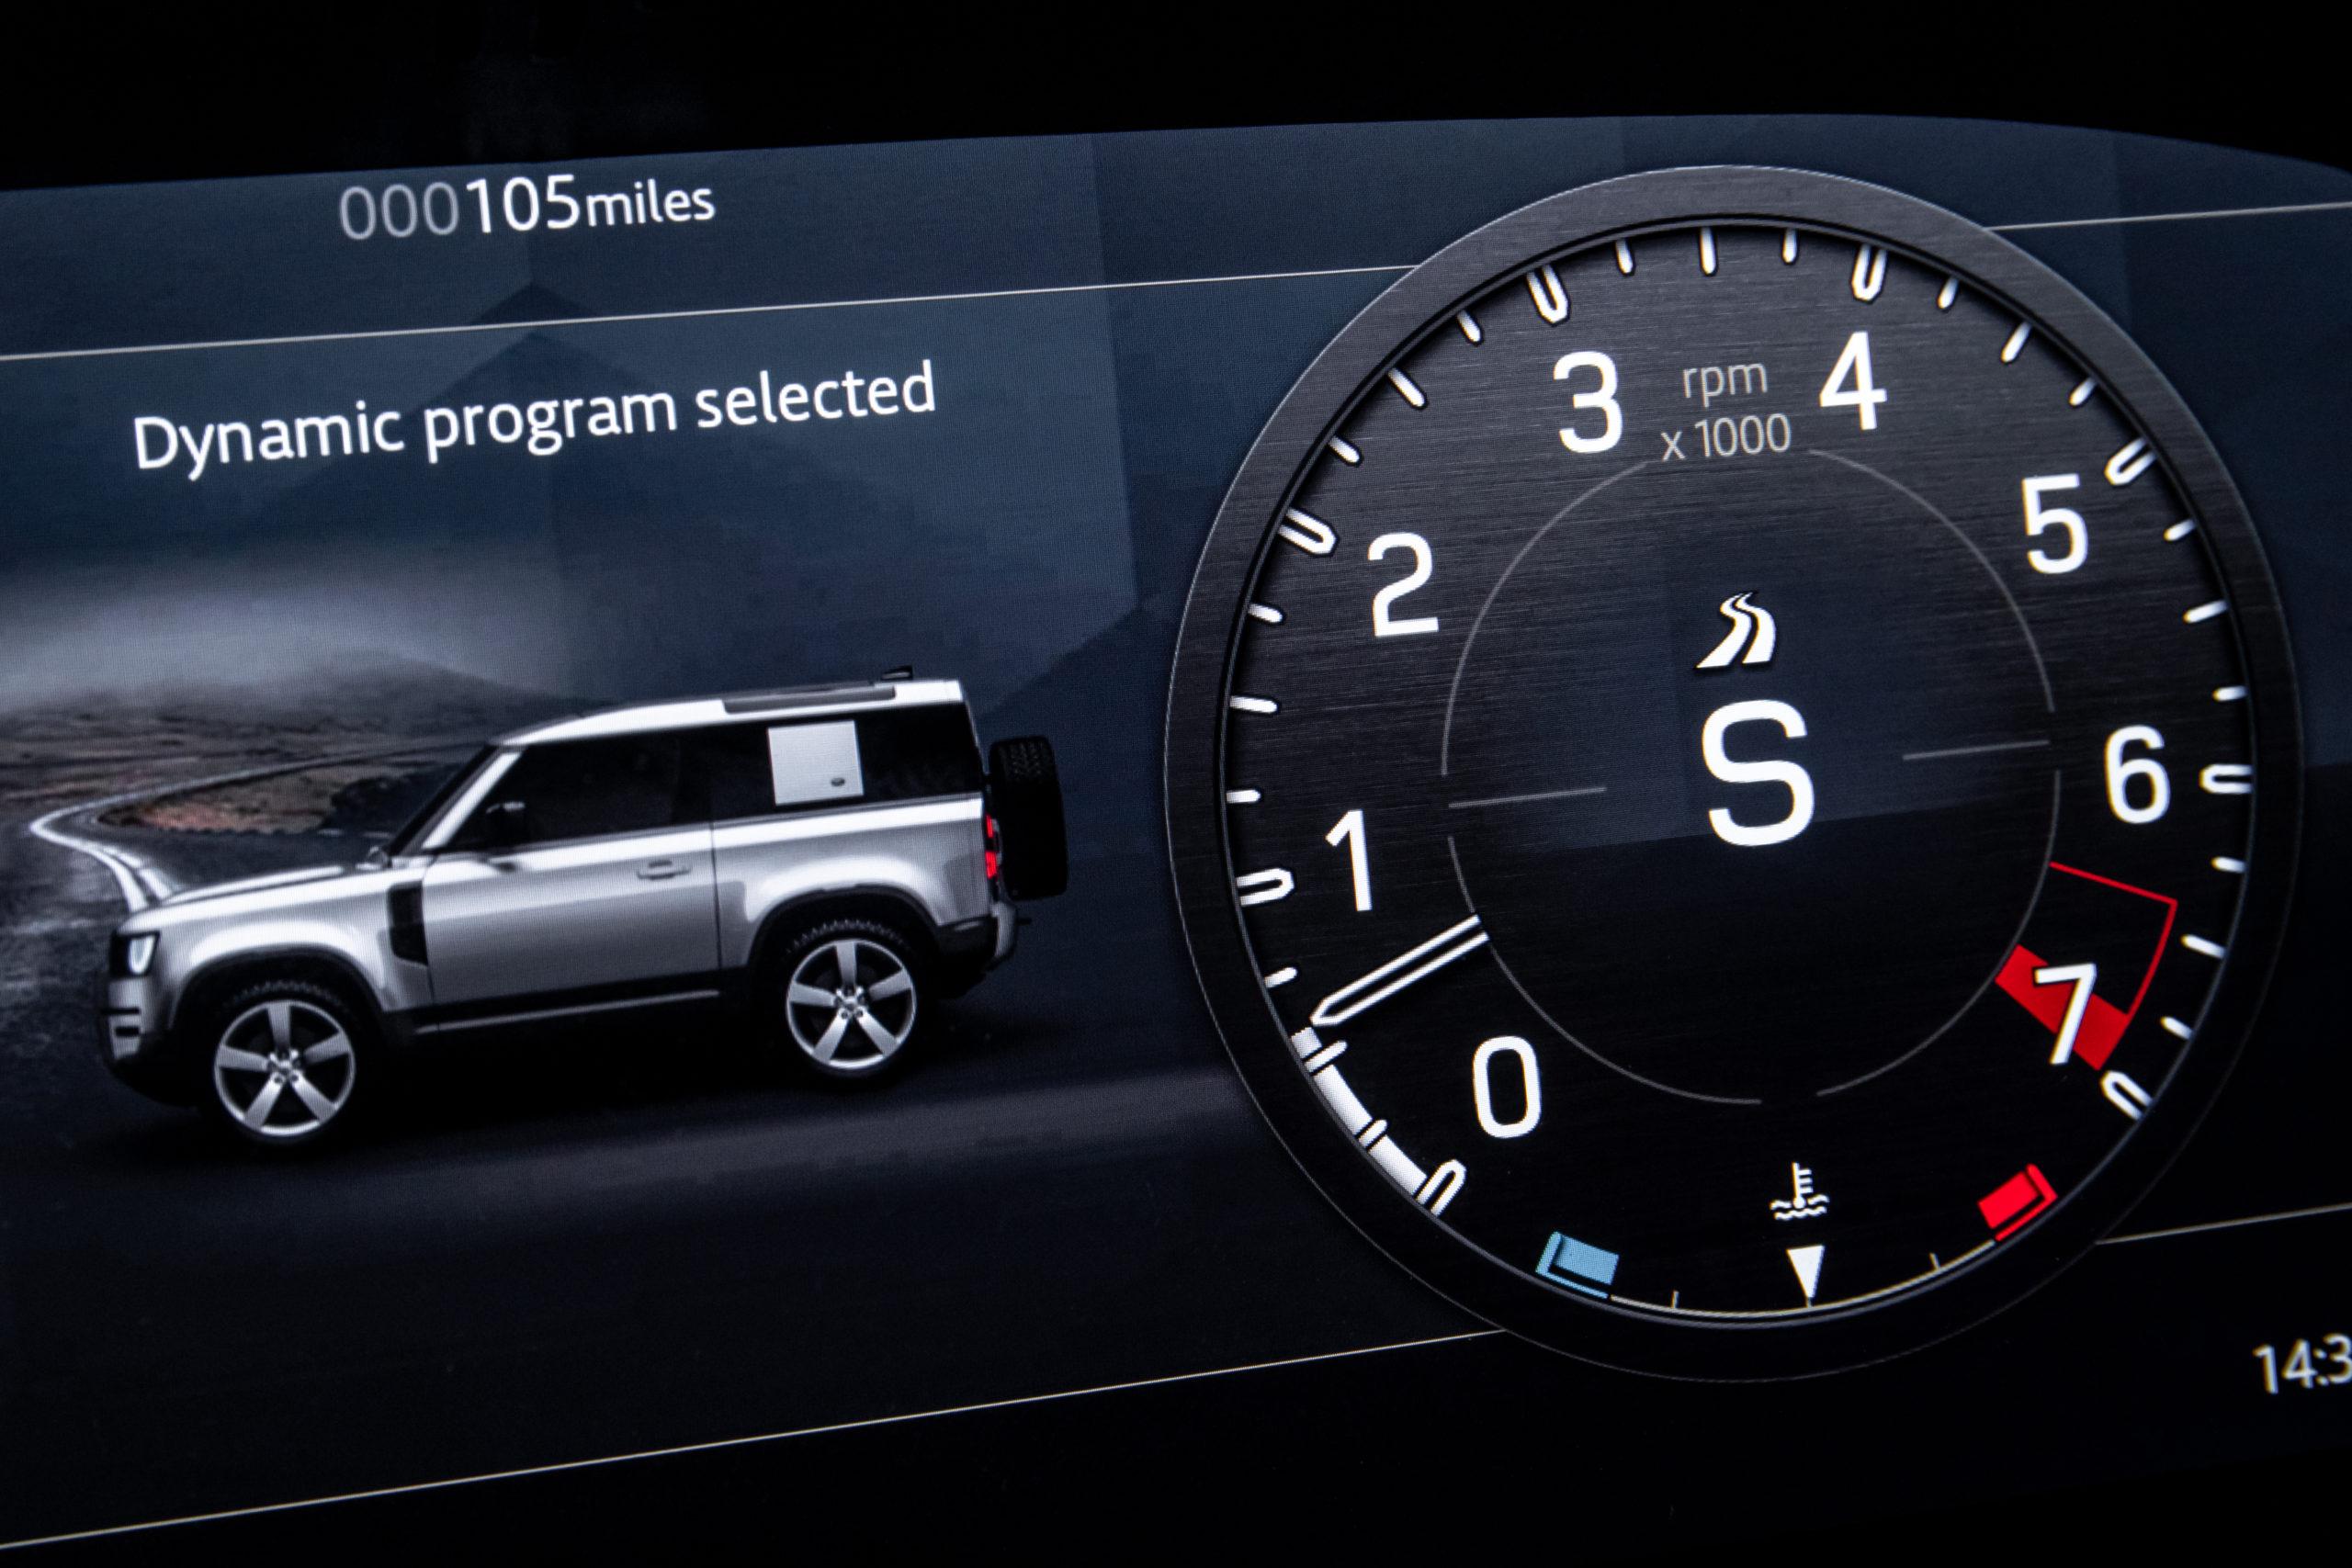 2022 Defender V8 Dynamic Program screen